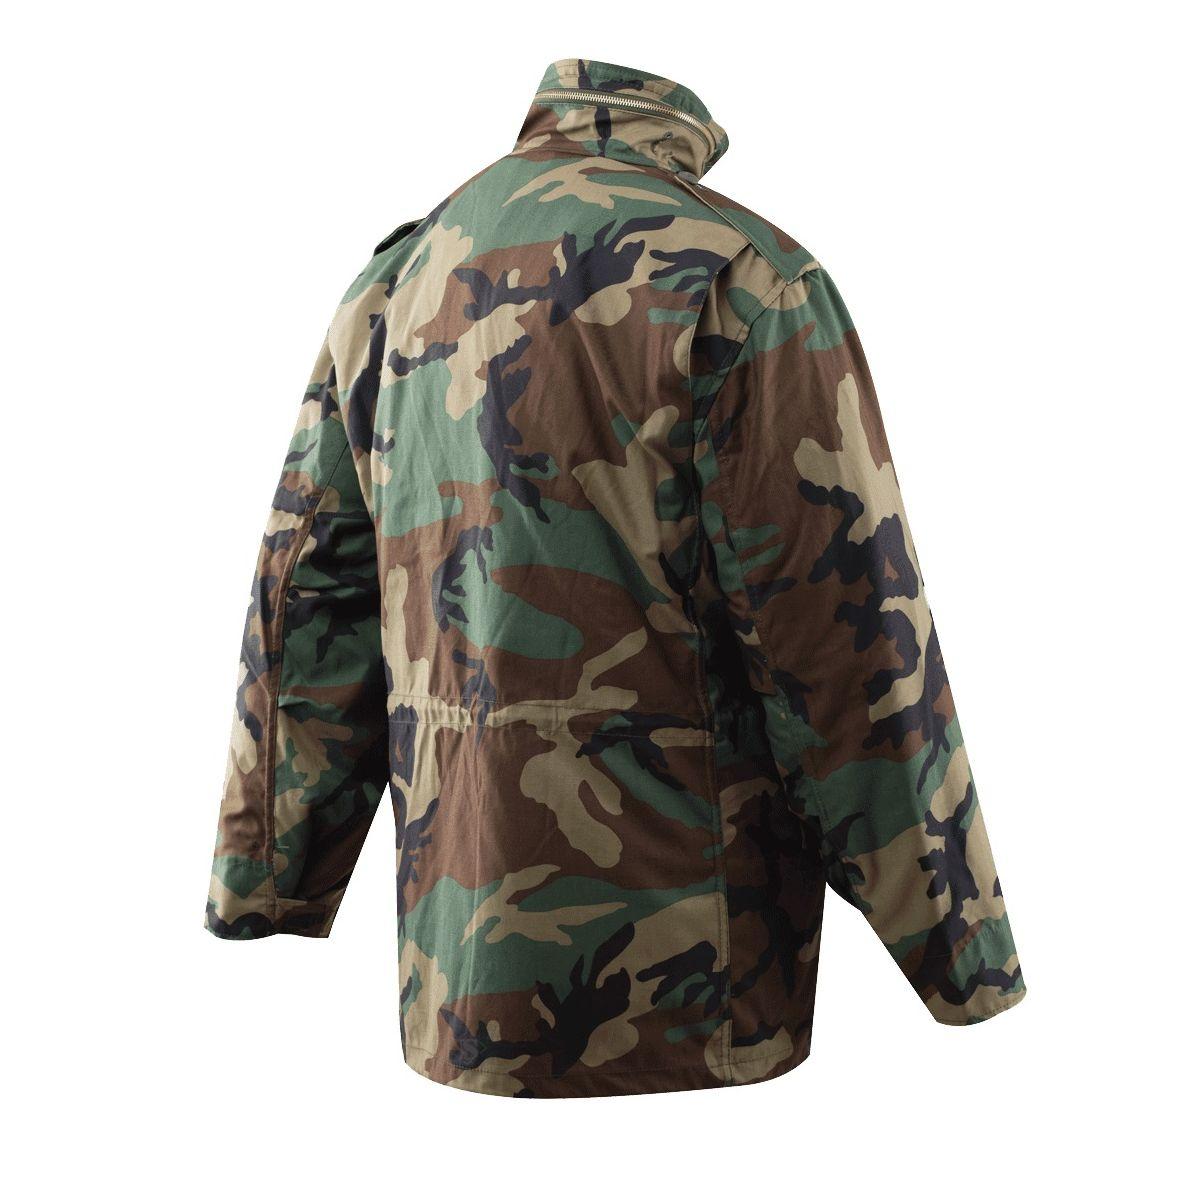 Jacket M65 with liner WOODLAND TRU-SPEC 24440 L-11